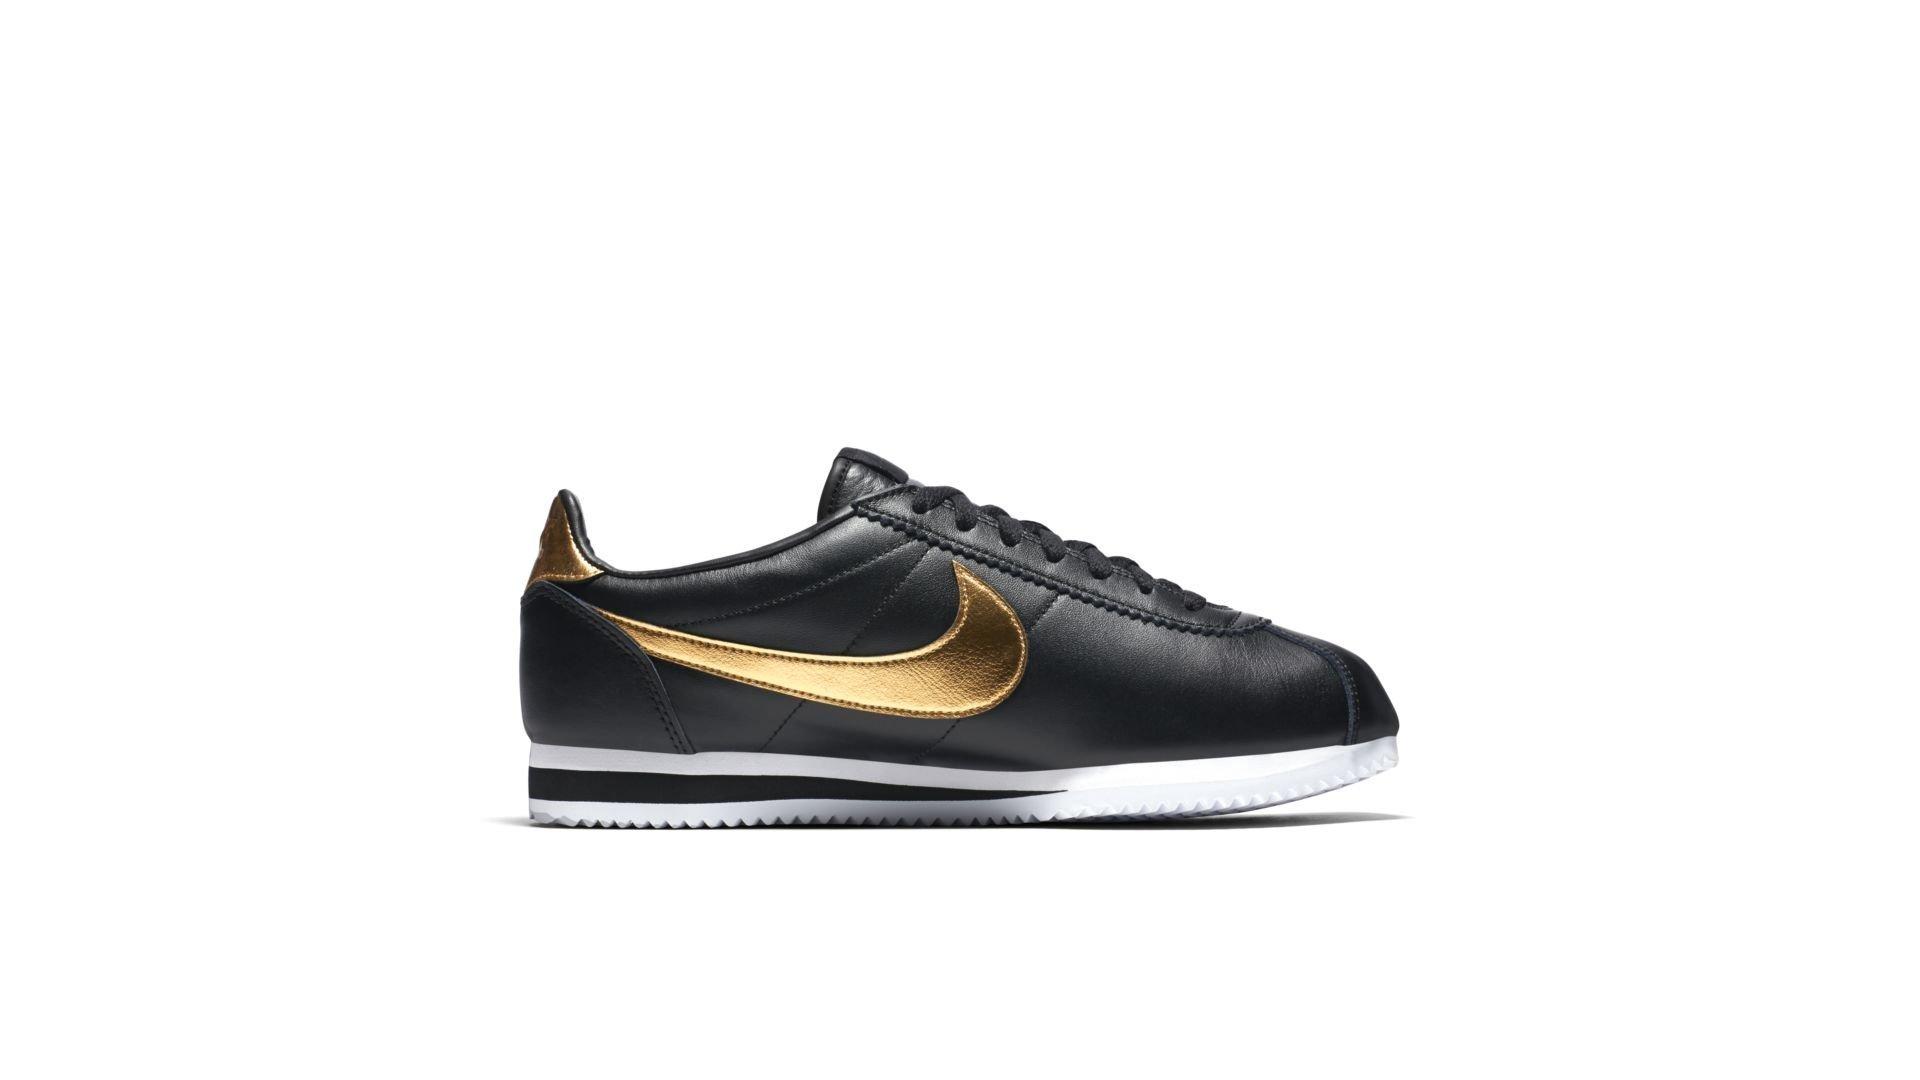 Nike Classic Cortez Black Metallic Gold (902801-002)